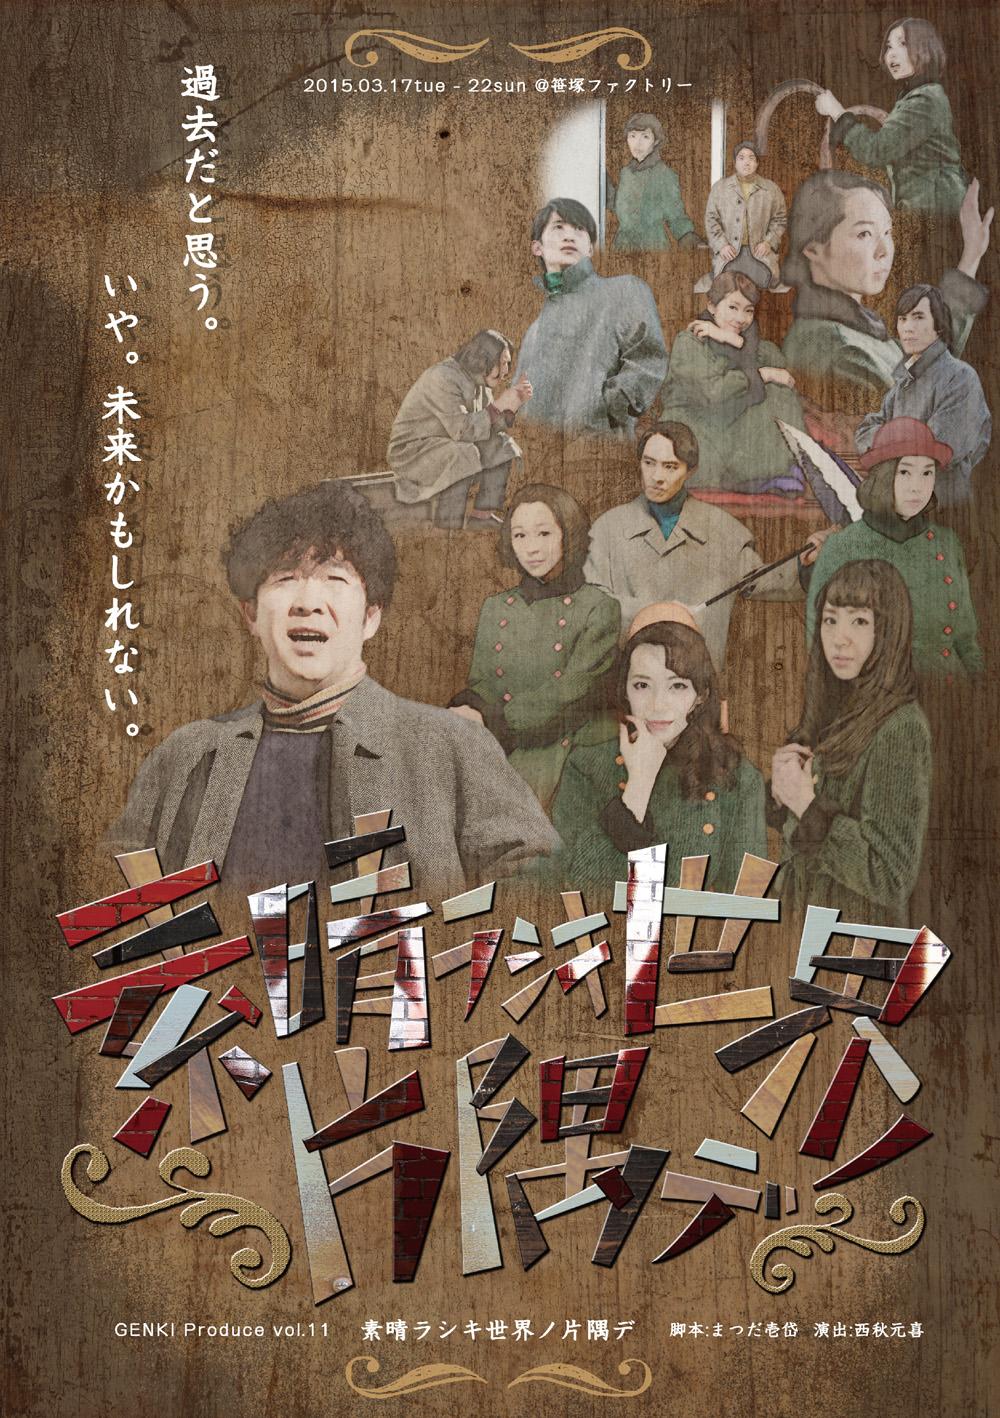 GENKI Produce Vol.11 「素晴ラシキ世界ノ片隅デ」